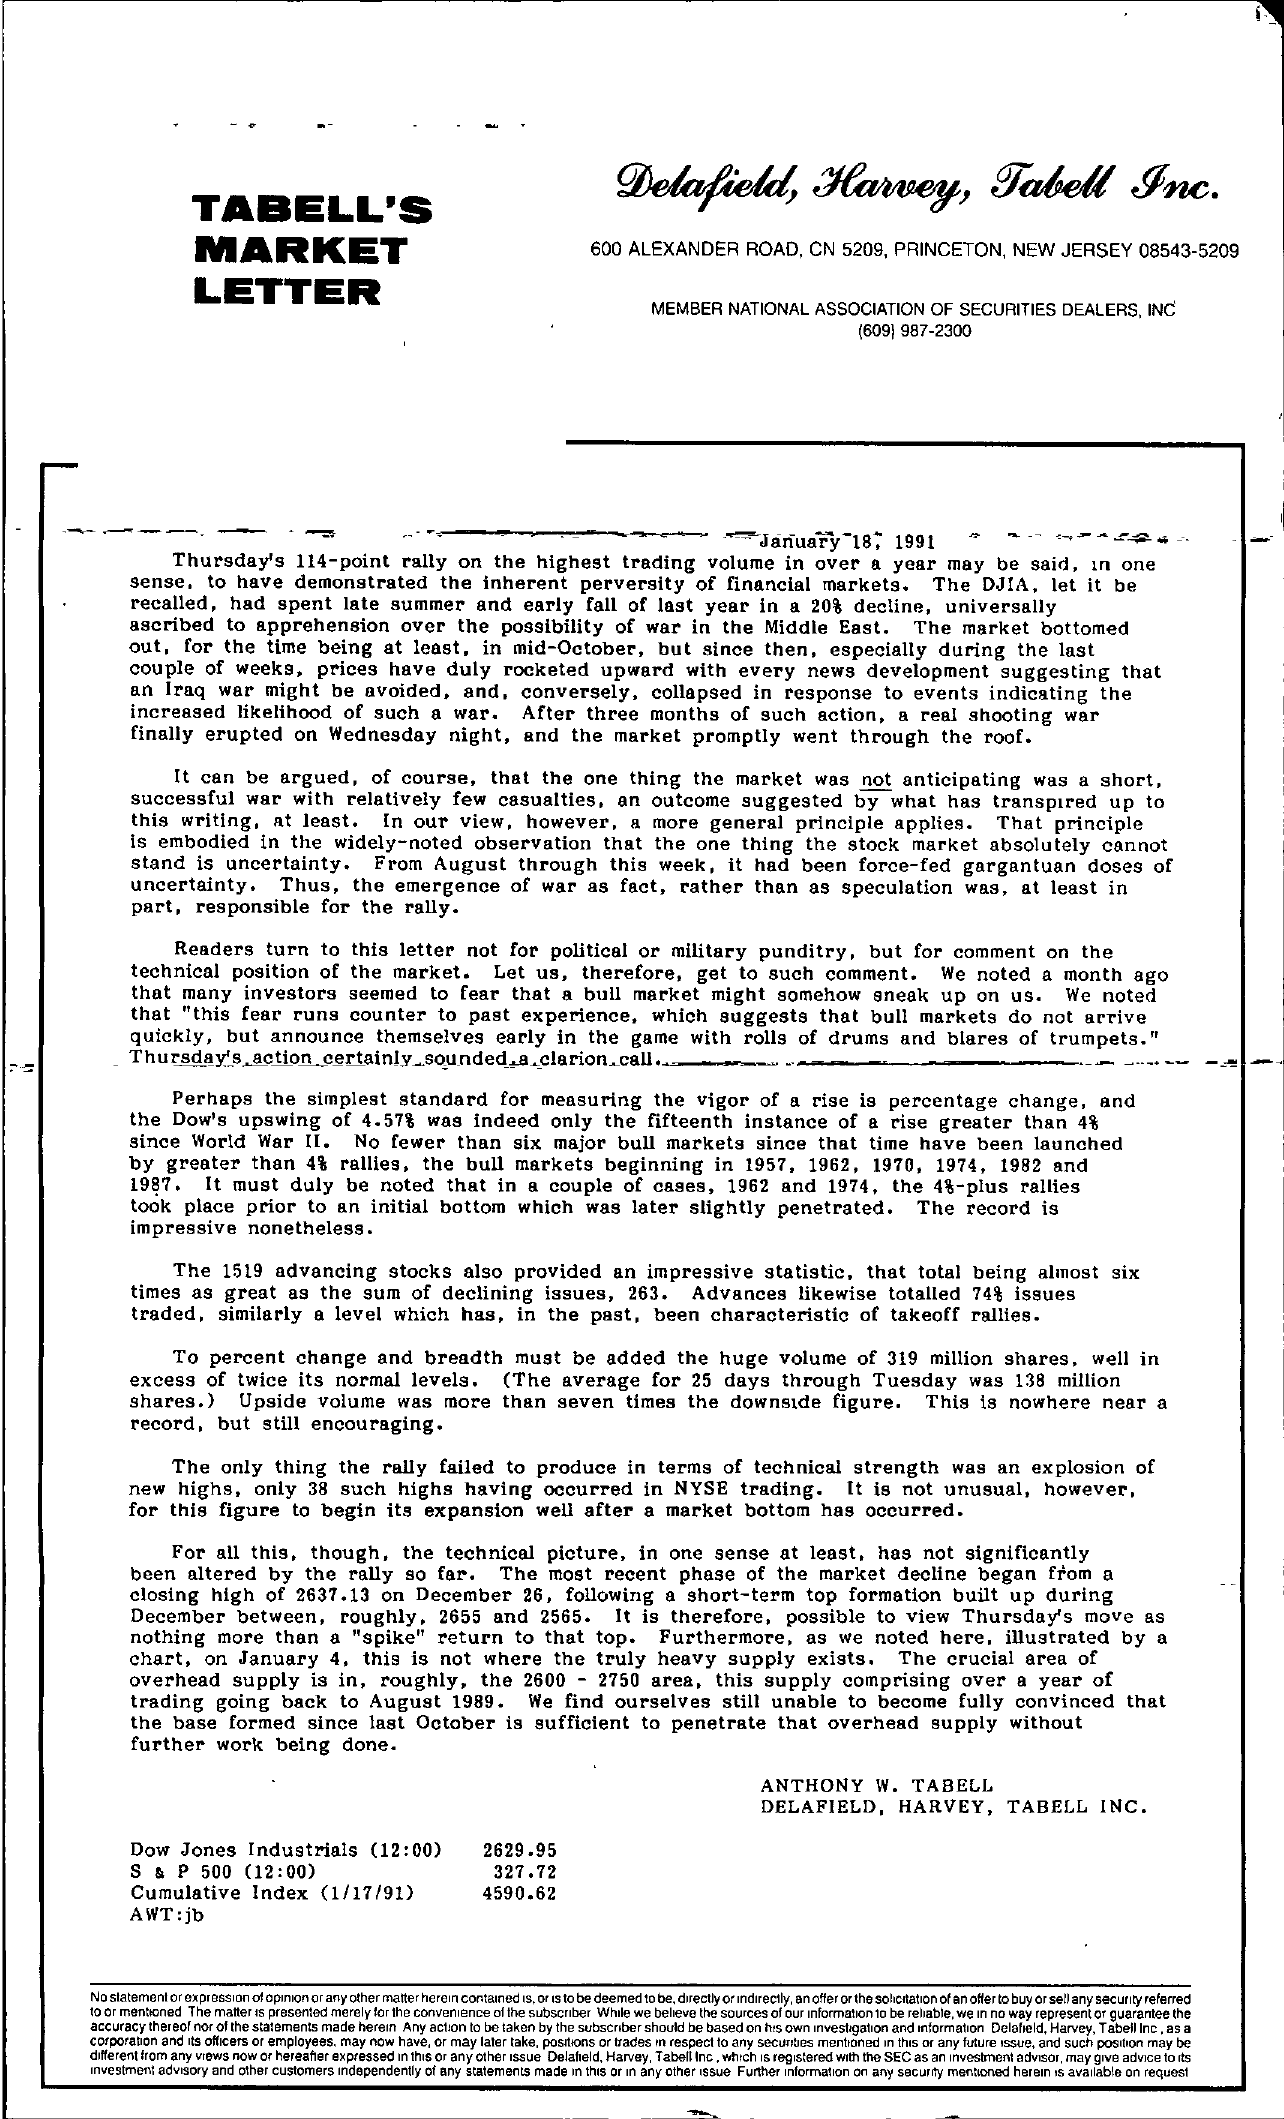 Tabell's Market Letter - January 18, 1991